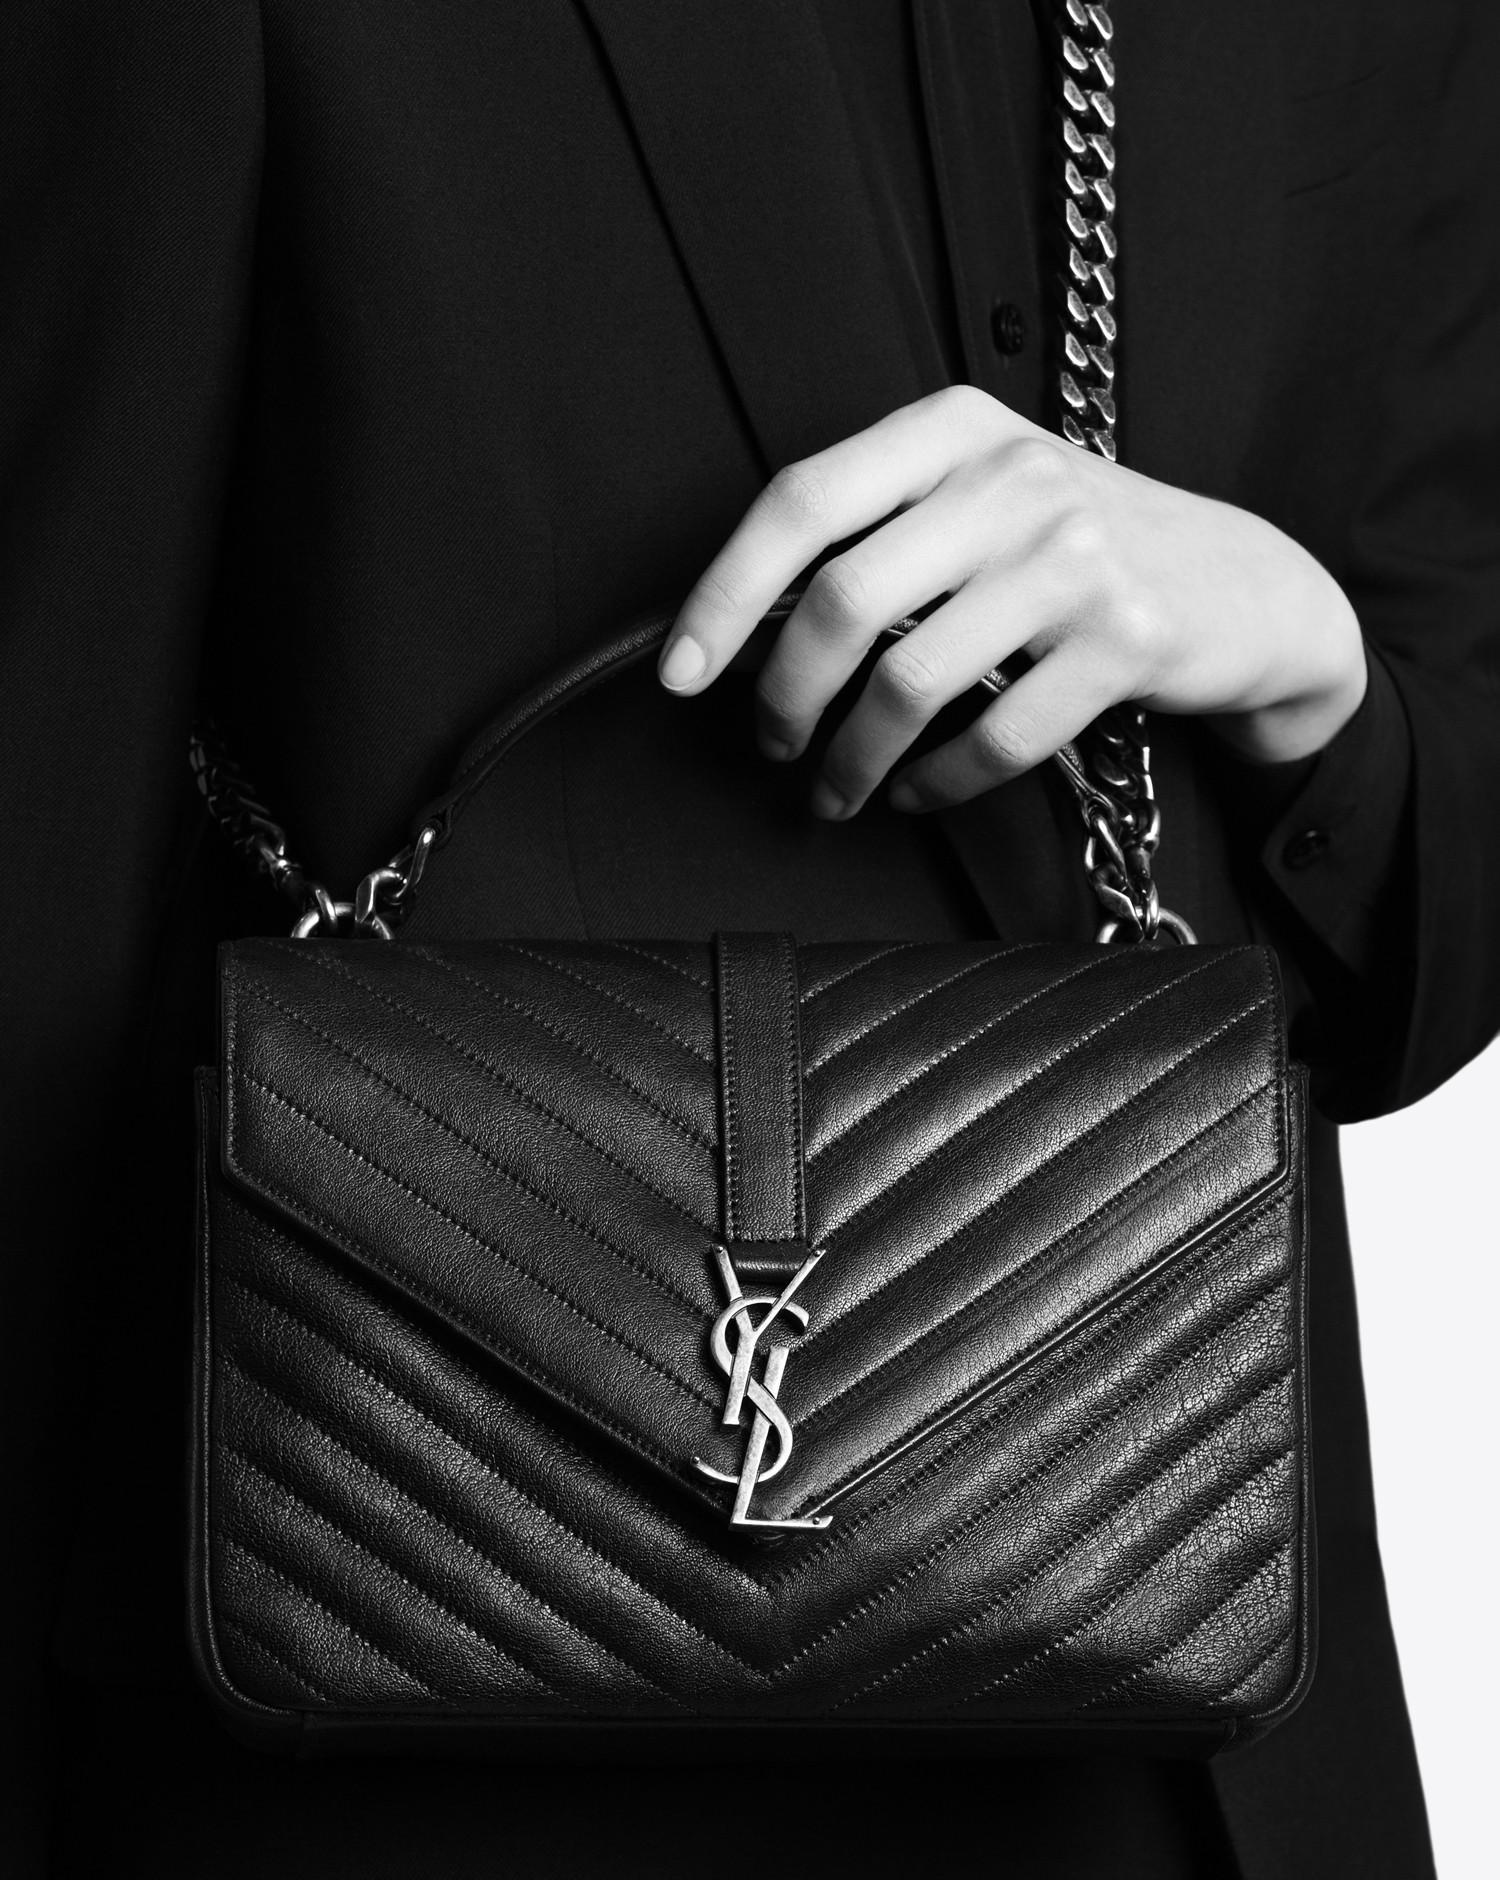 7ead25d92e62 Saint Laurent - Black Monogram College Medium Quilted Leather Shoulder Bag  - Lyst. View fullscreen